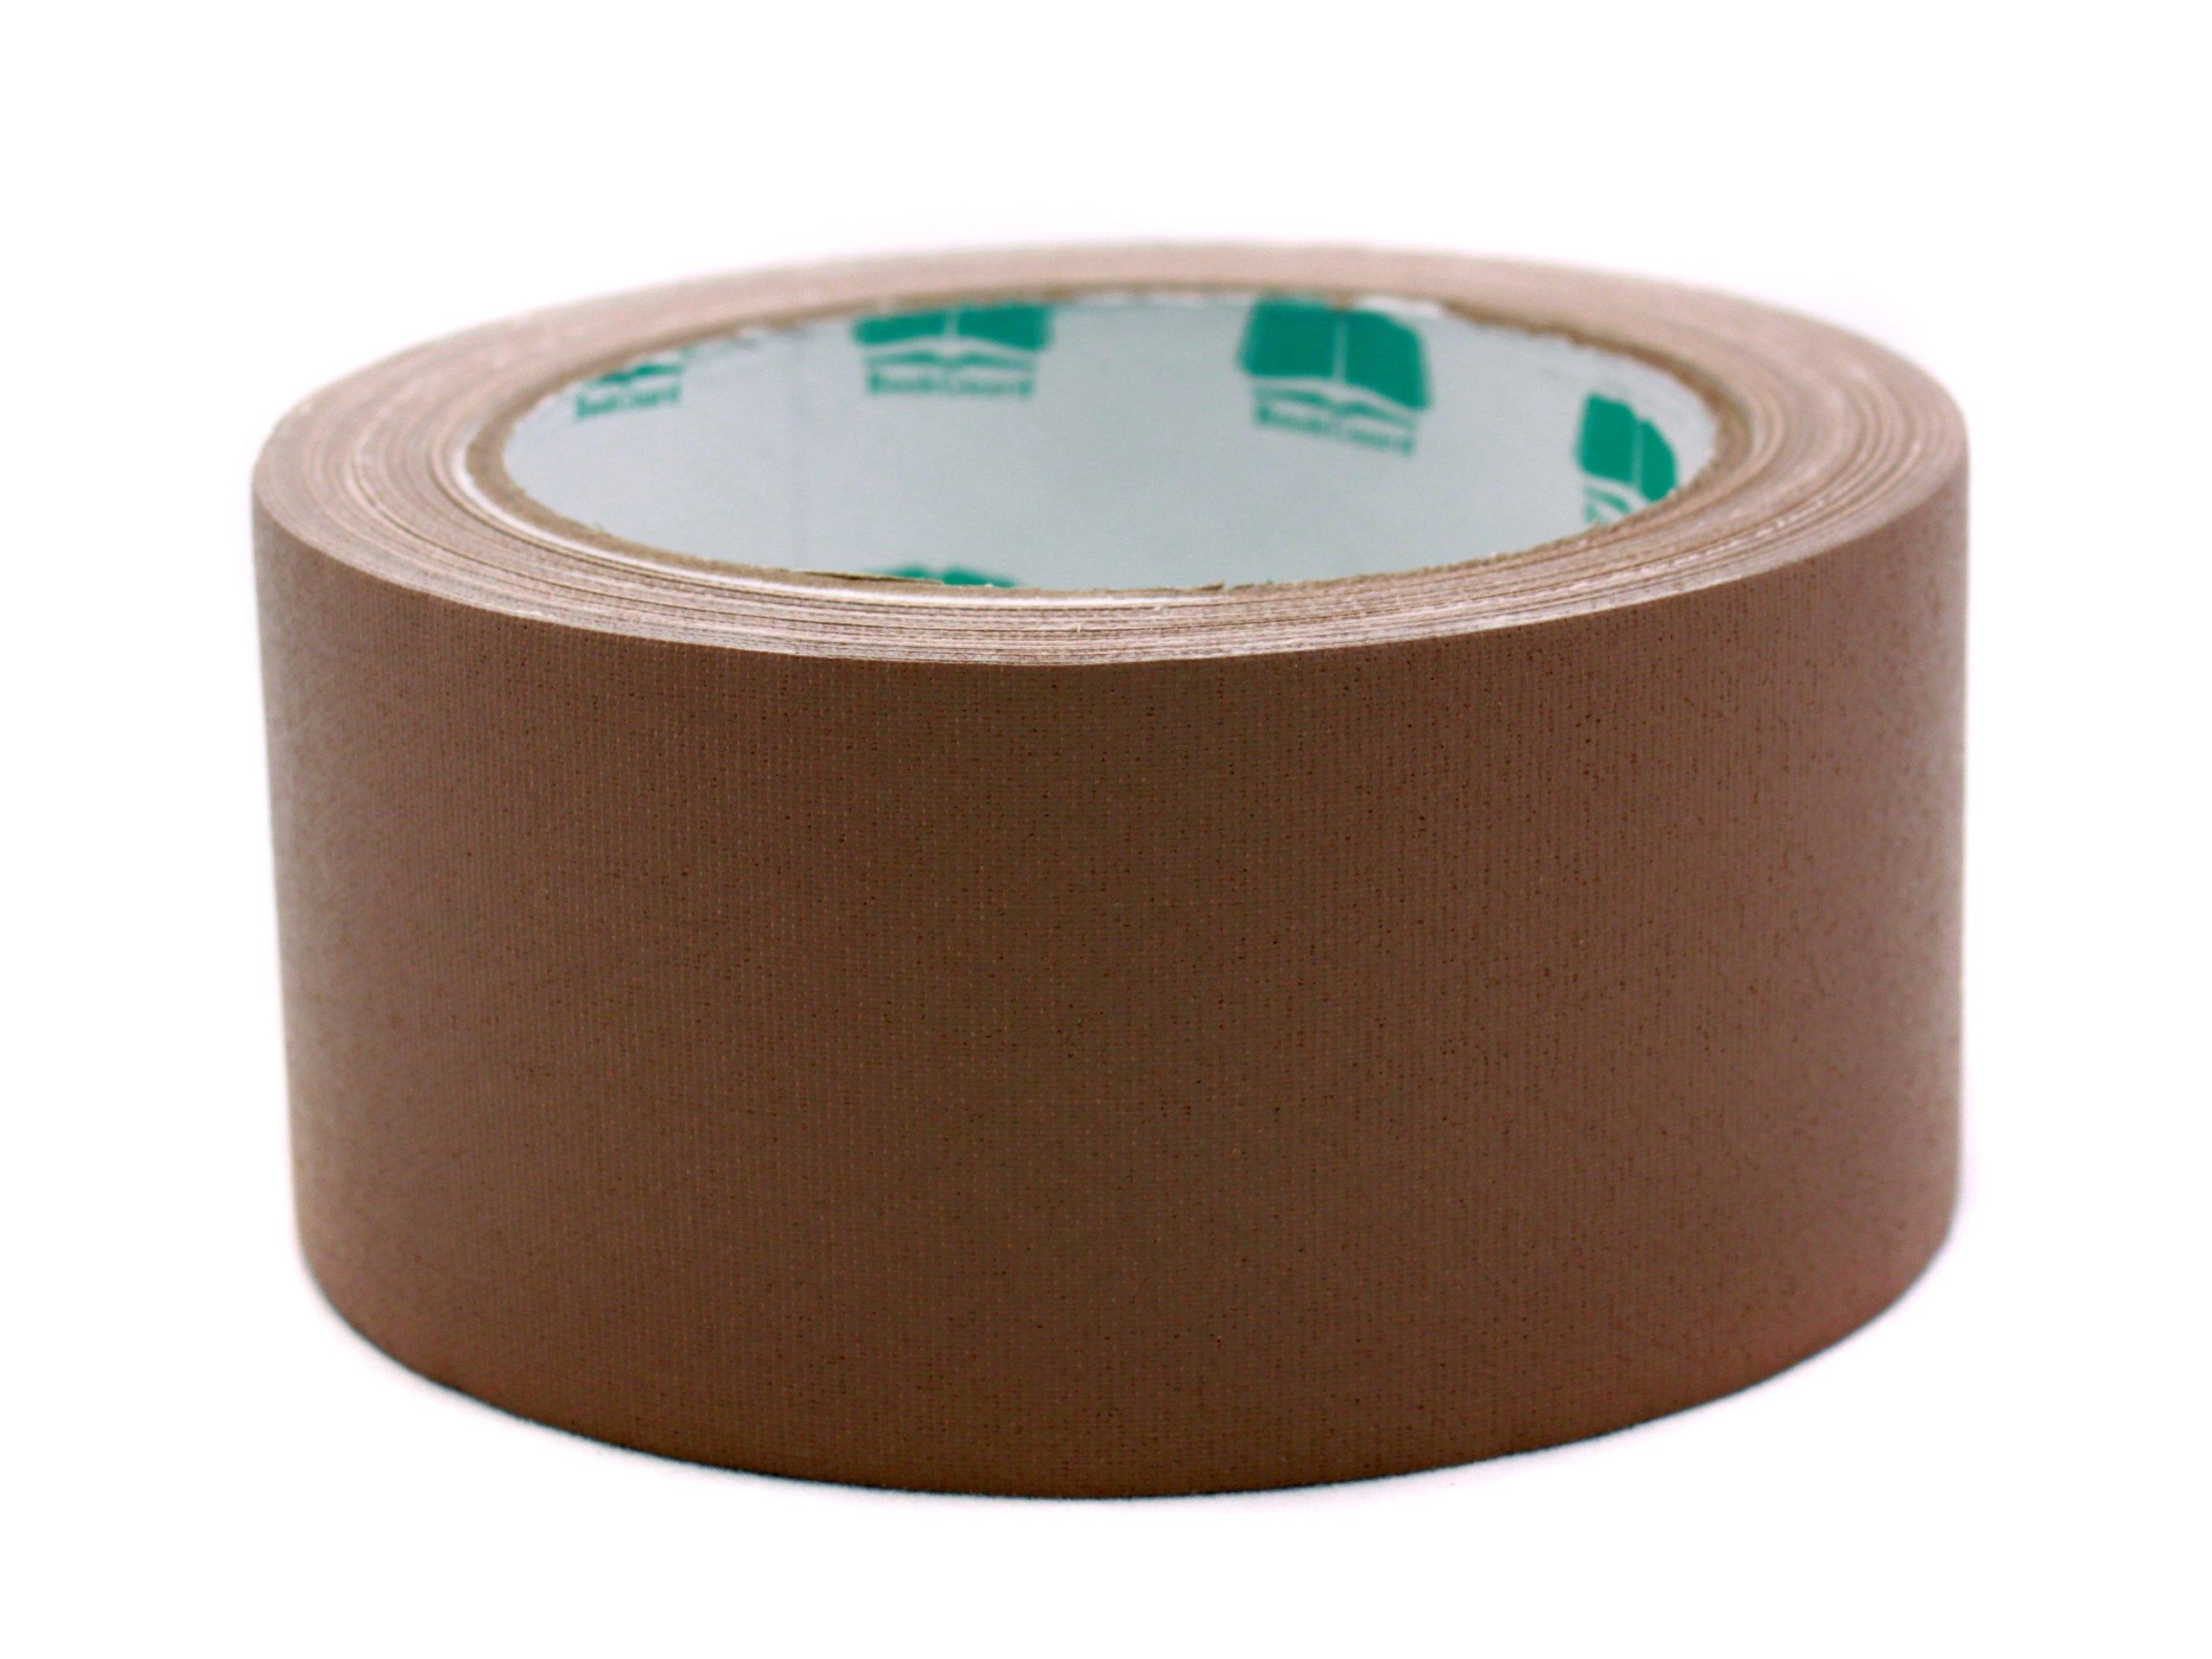 2'' Brown Colored Premium-Cloth Book Binding Repair Tape | 15 Yard Roll (BookGuard Brand) by Chromalabel.com (Image #1)